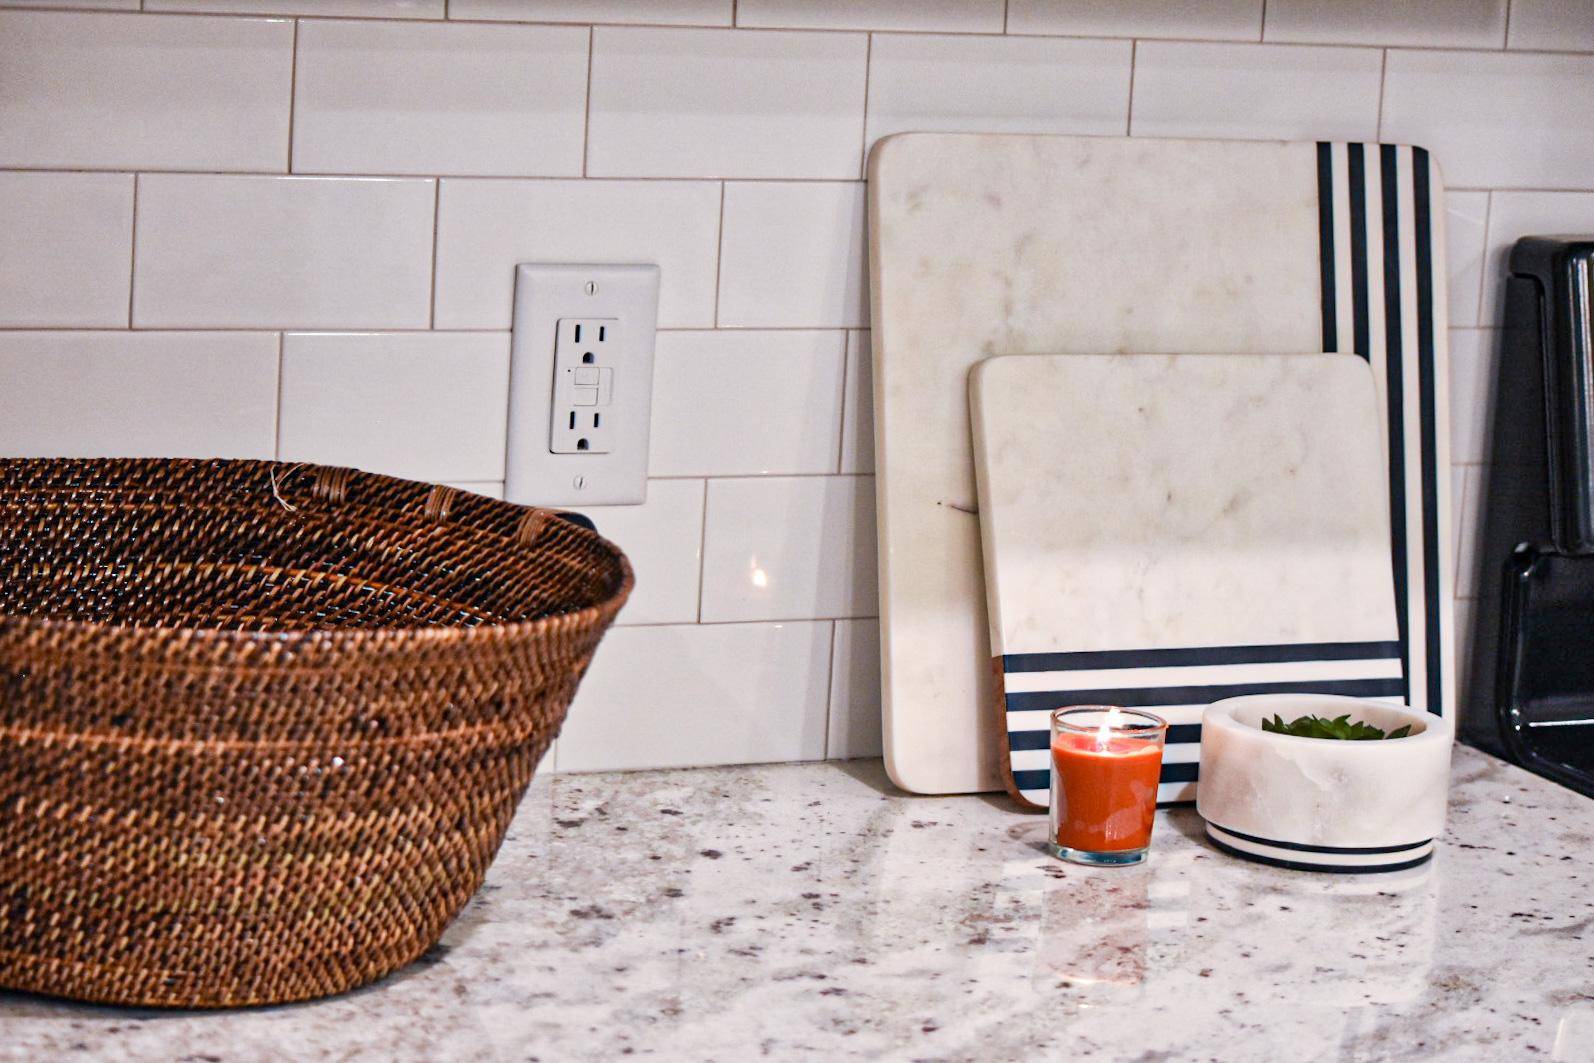 evolve simplify blog kitchen counter